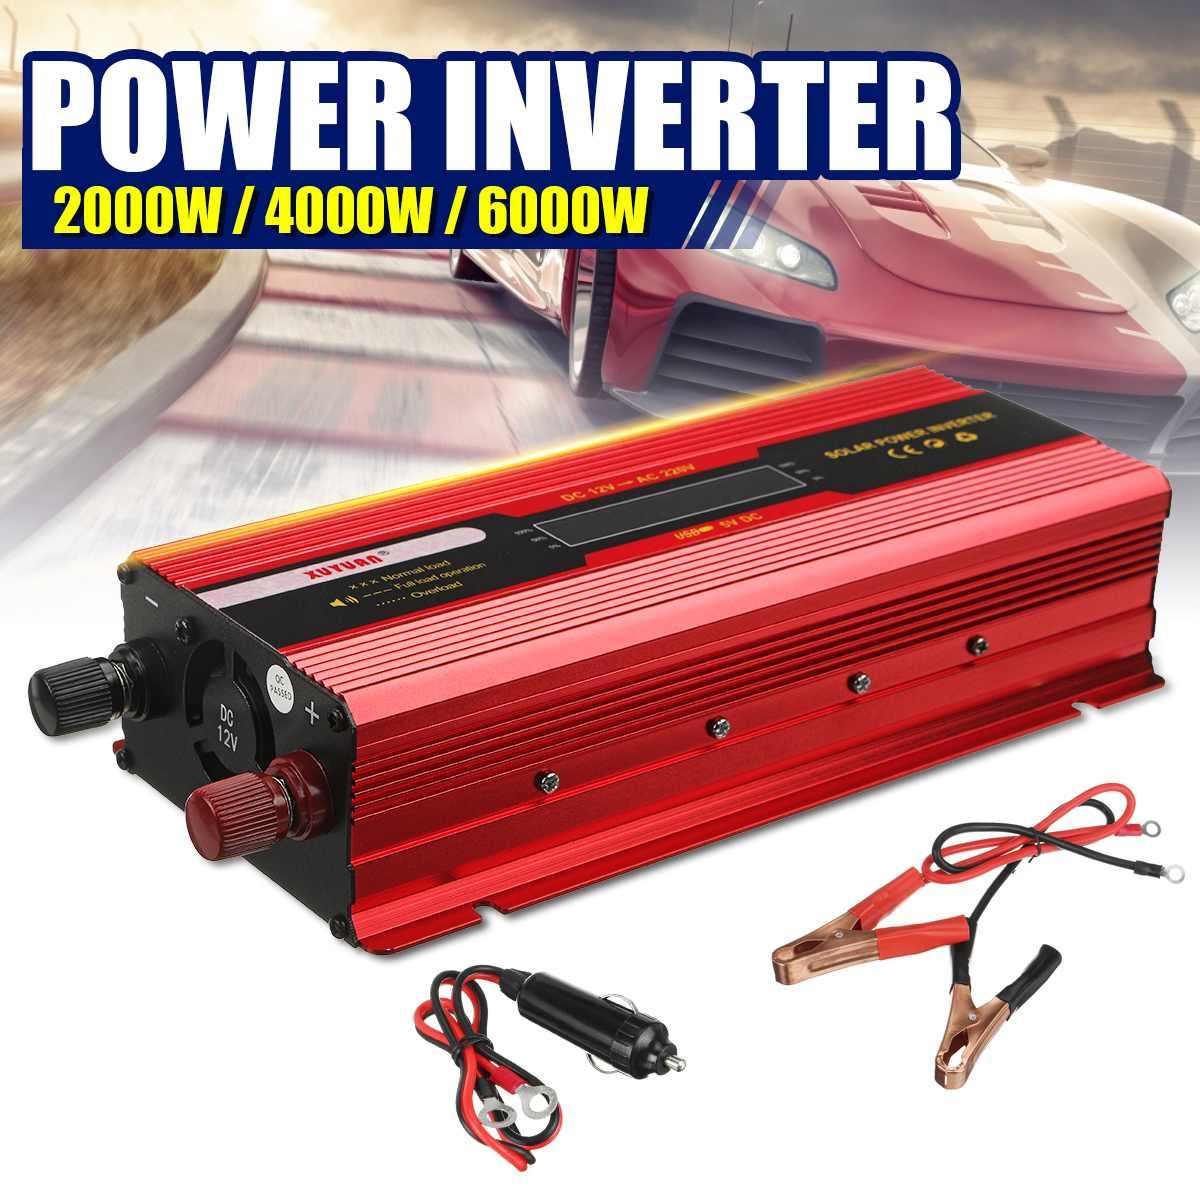 Auto Inverter DC 12V zu AC 220V power inverter Modifizierte Sinus Welle 2000 W/4000 W/ 6000W LCD display Solar USB auto Transformator Konvertieren